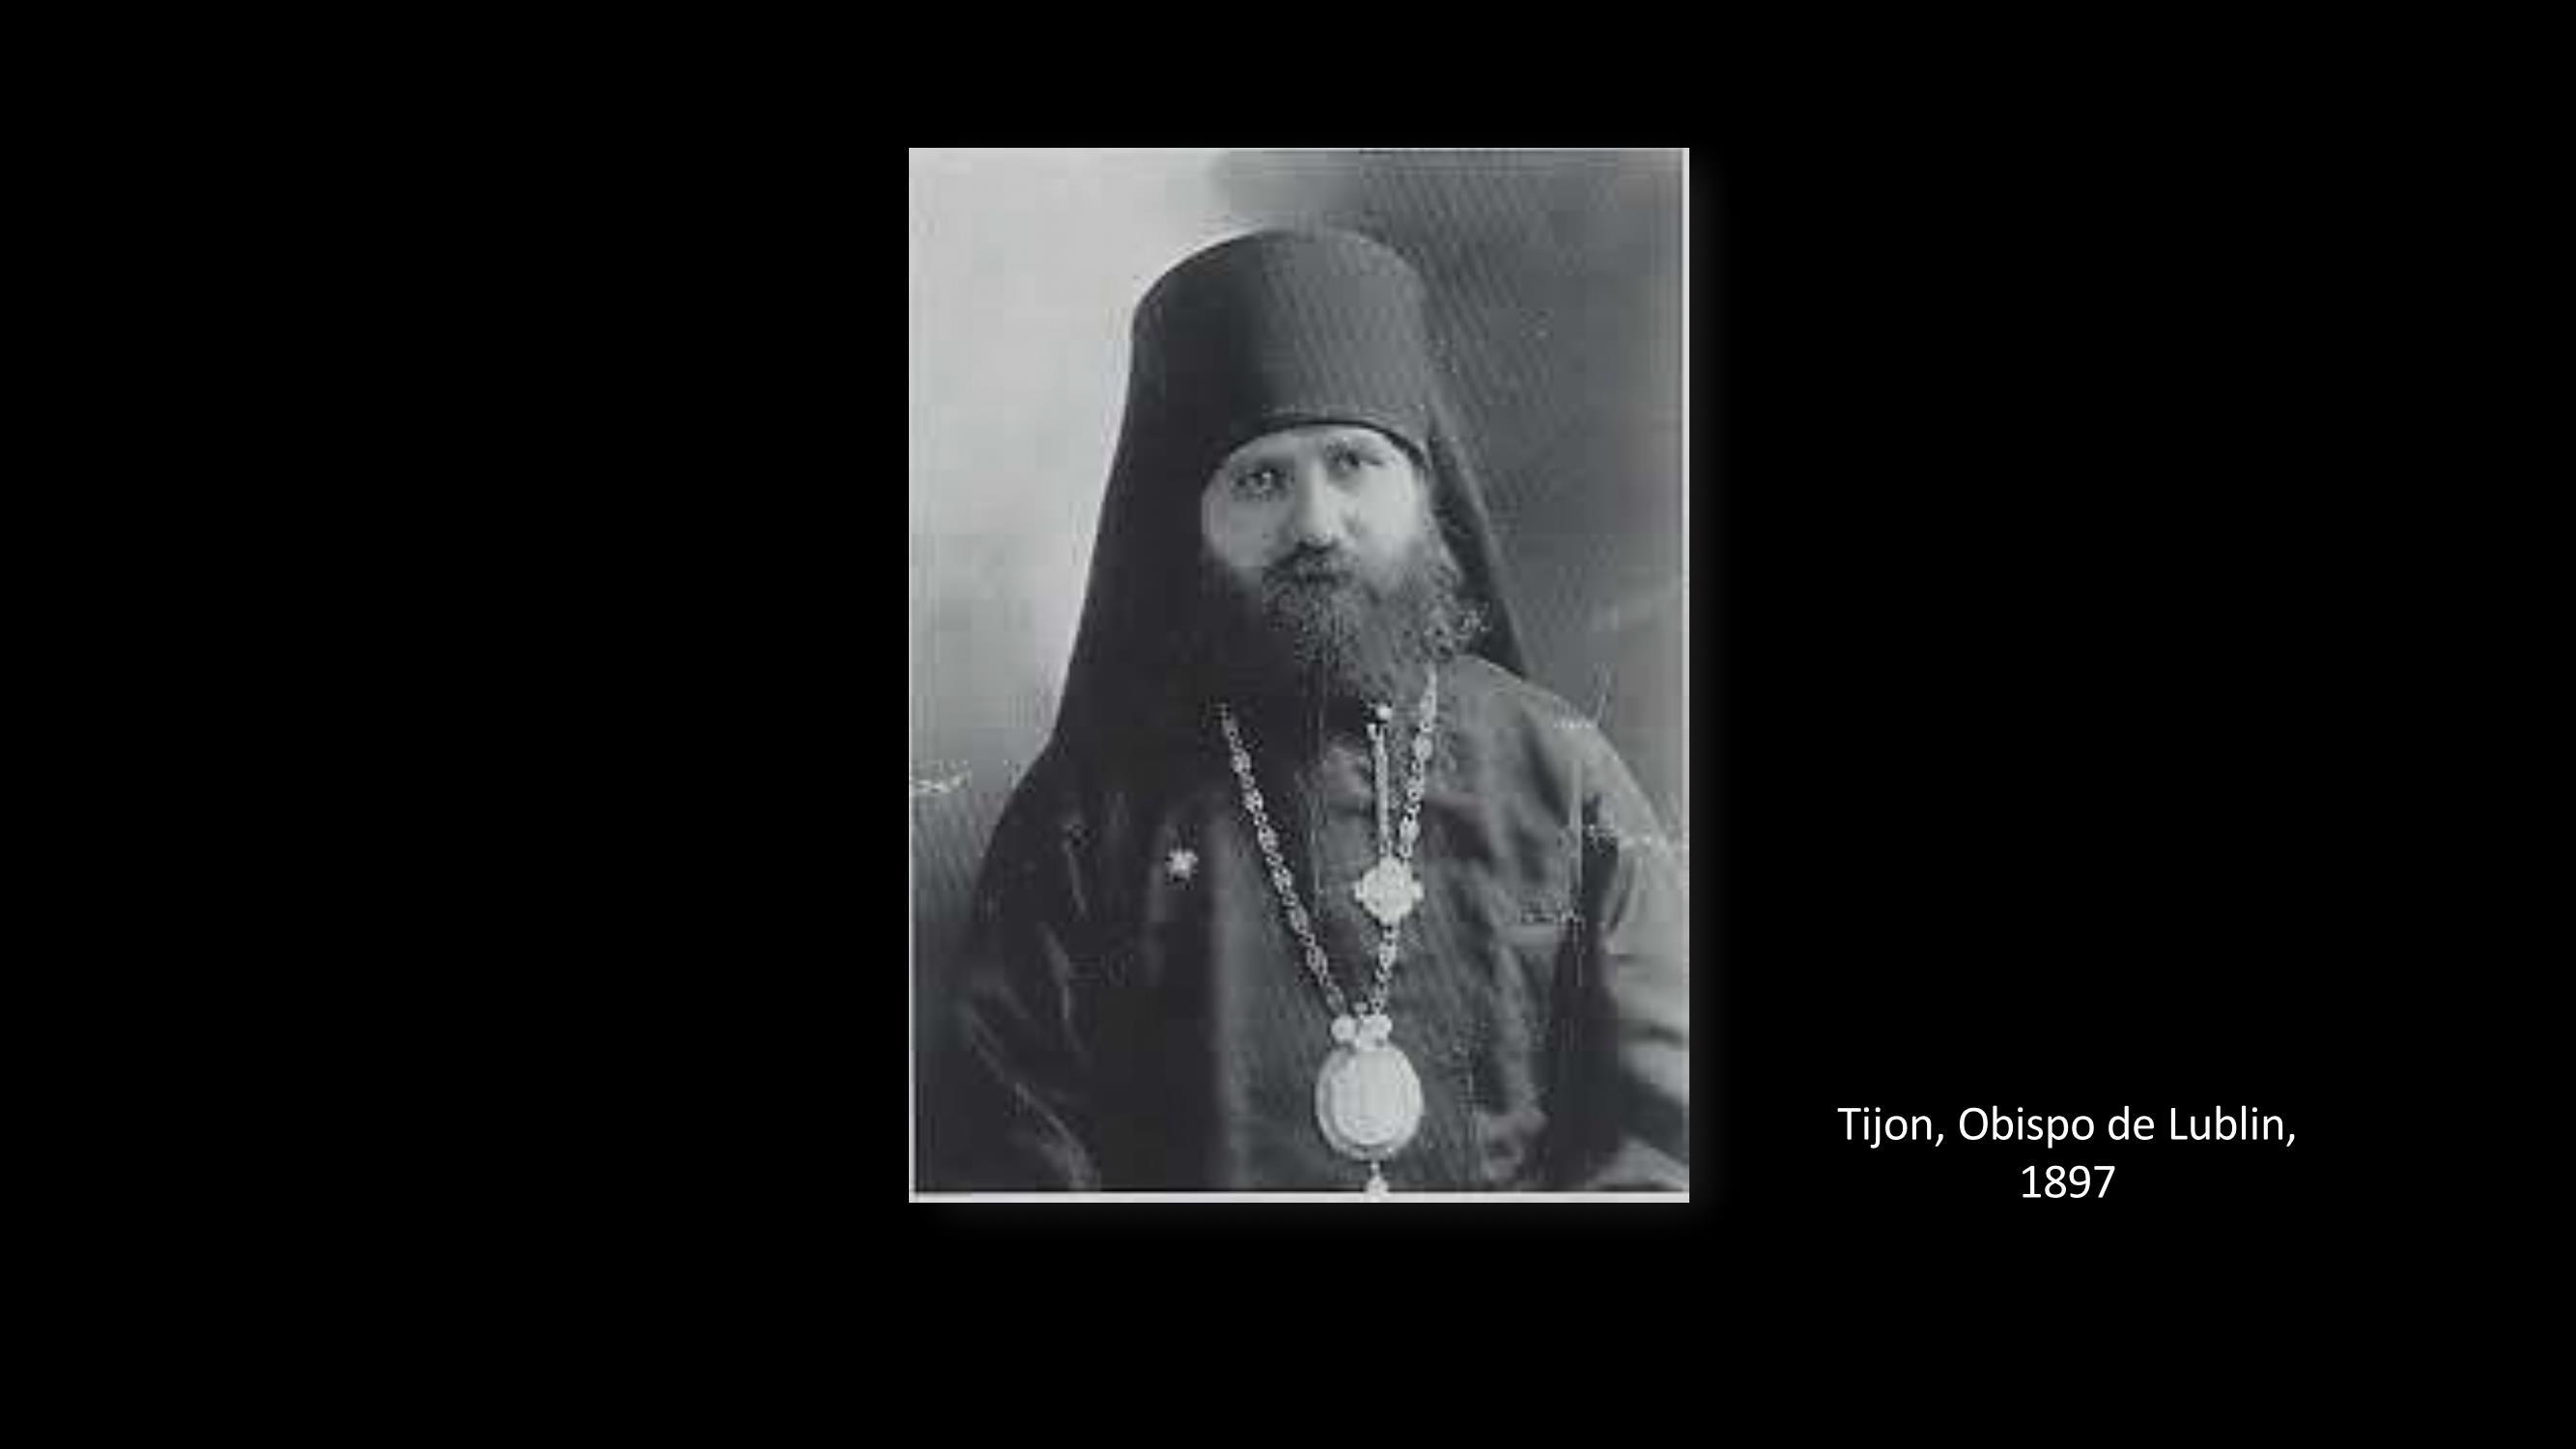 [4] Tron, obispo de Lublin